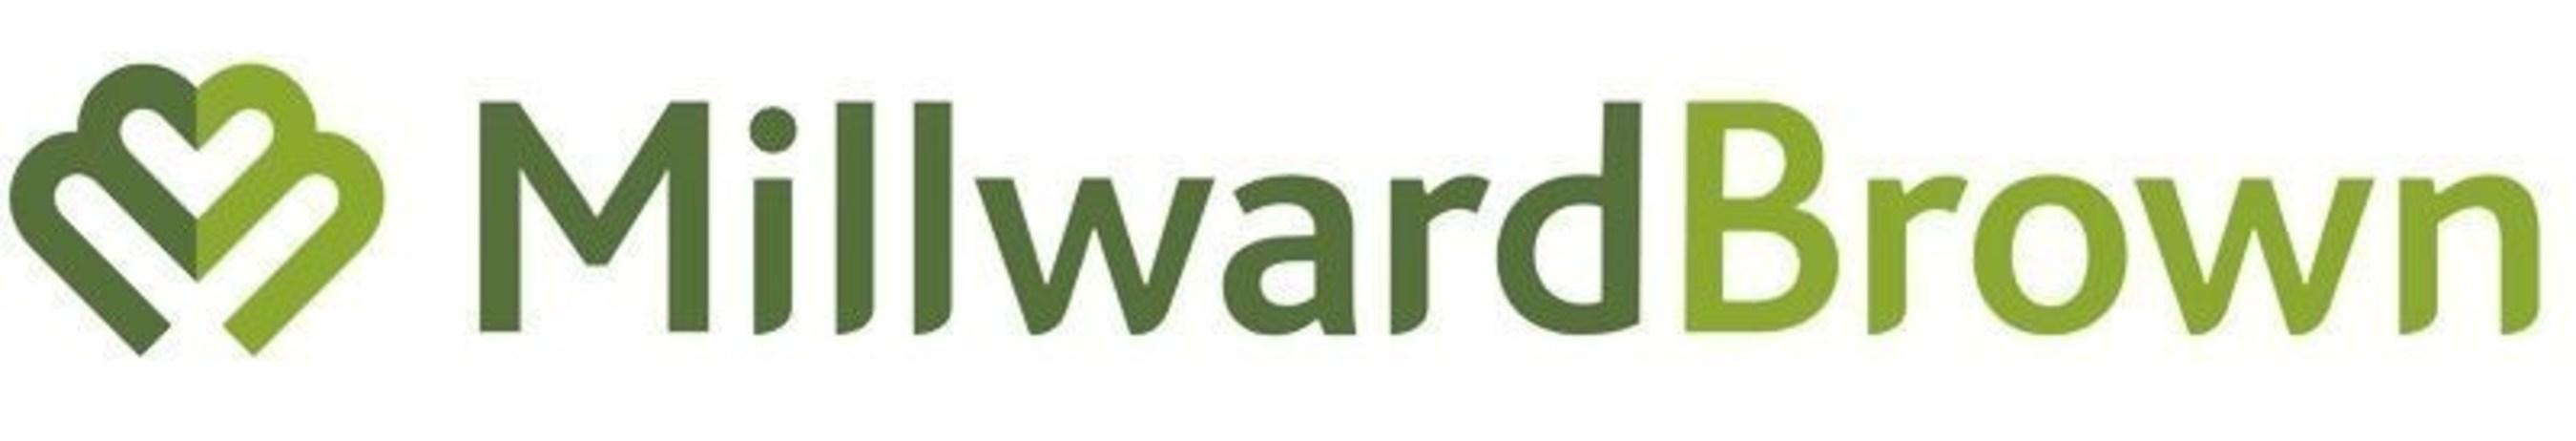 Millward Brown Logo (PRNewsFoto/Millward Brown) (PRNewsFoto/Millward Brown)